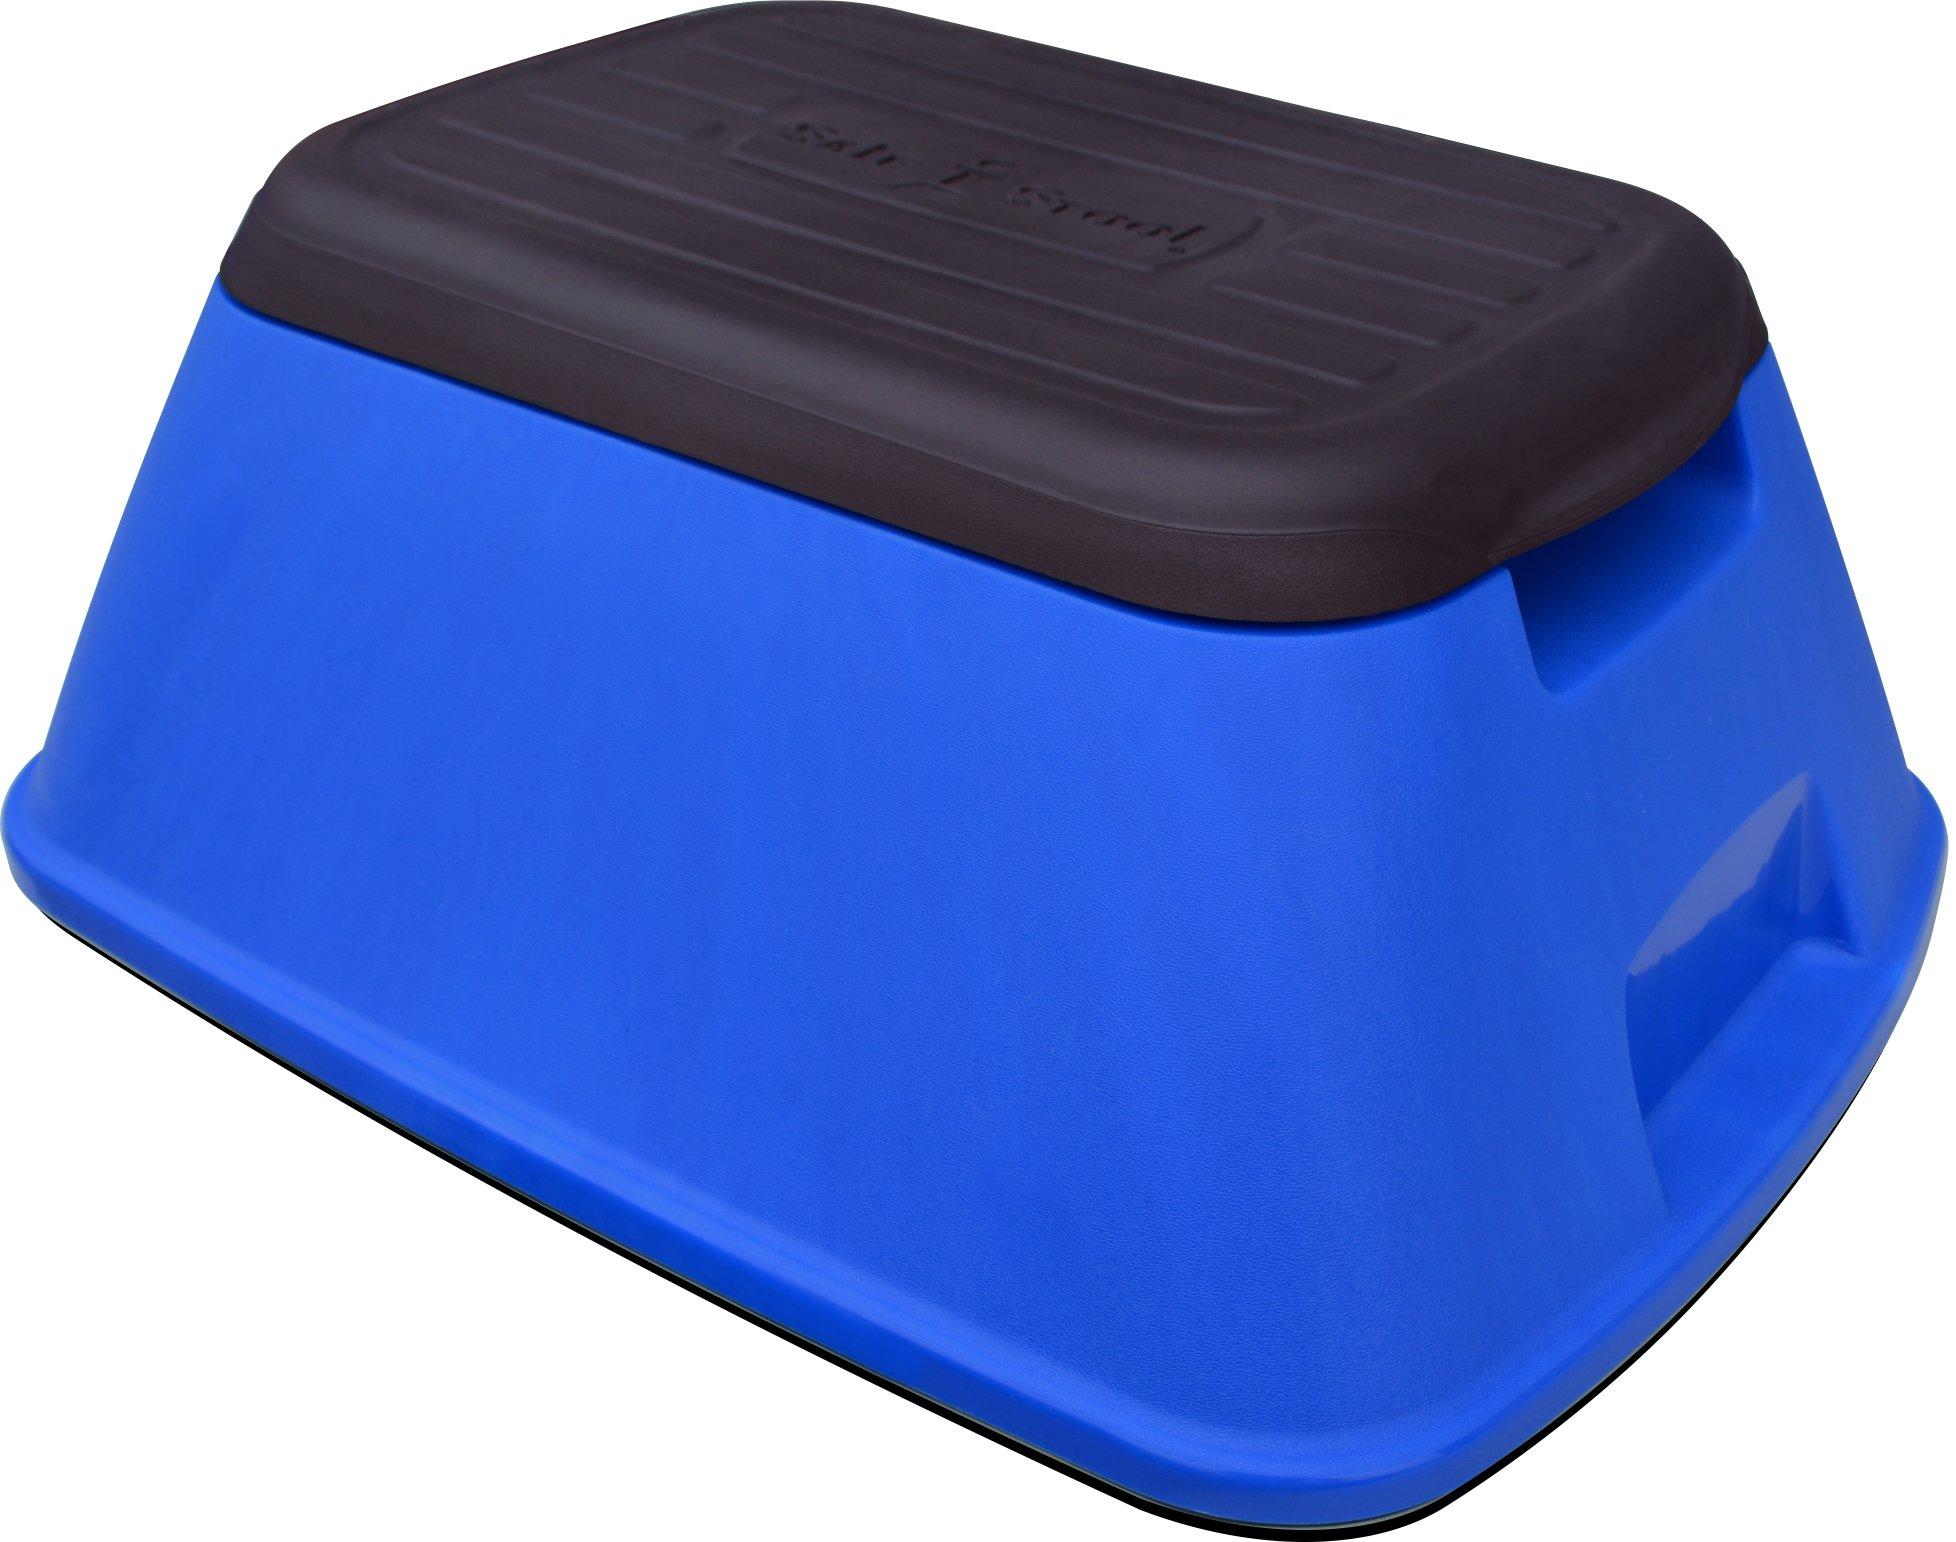 Safe-T-Stool the Safest, Most Versatile Stool in America (Matte Blue)